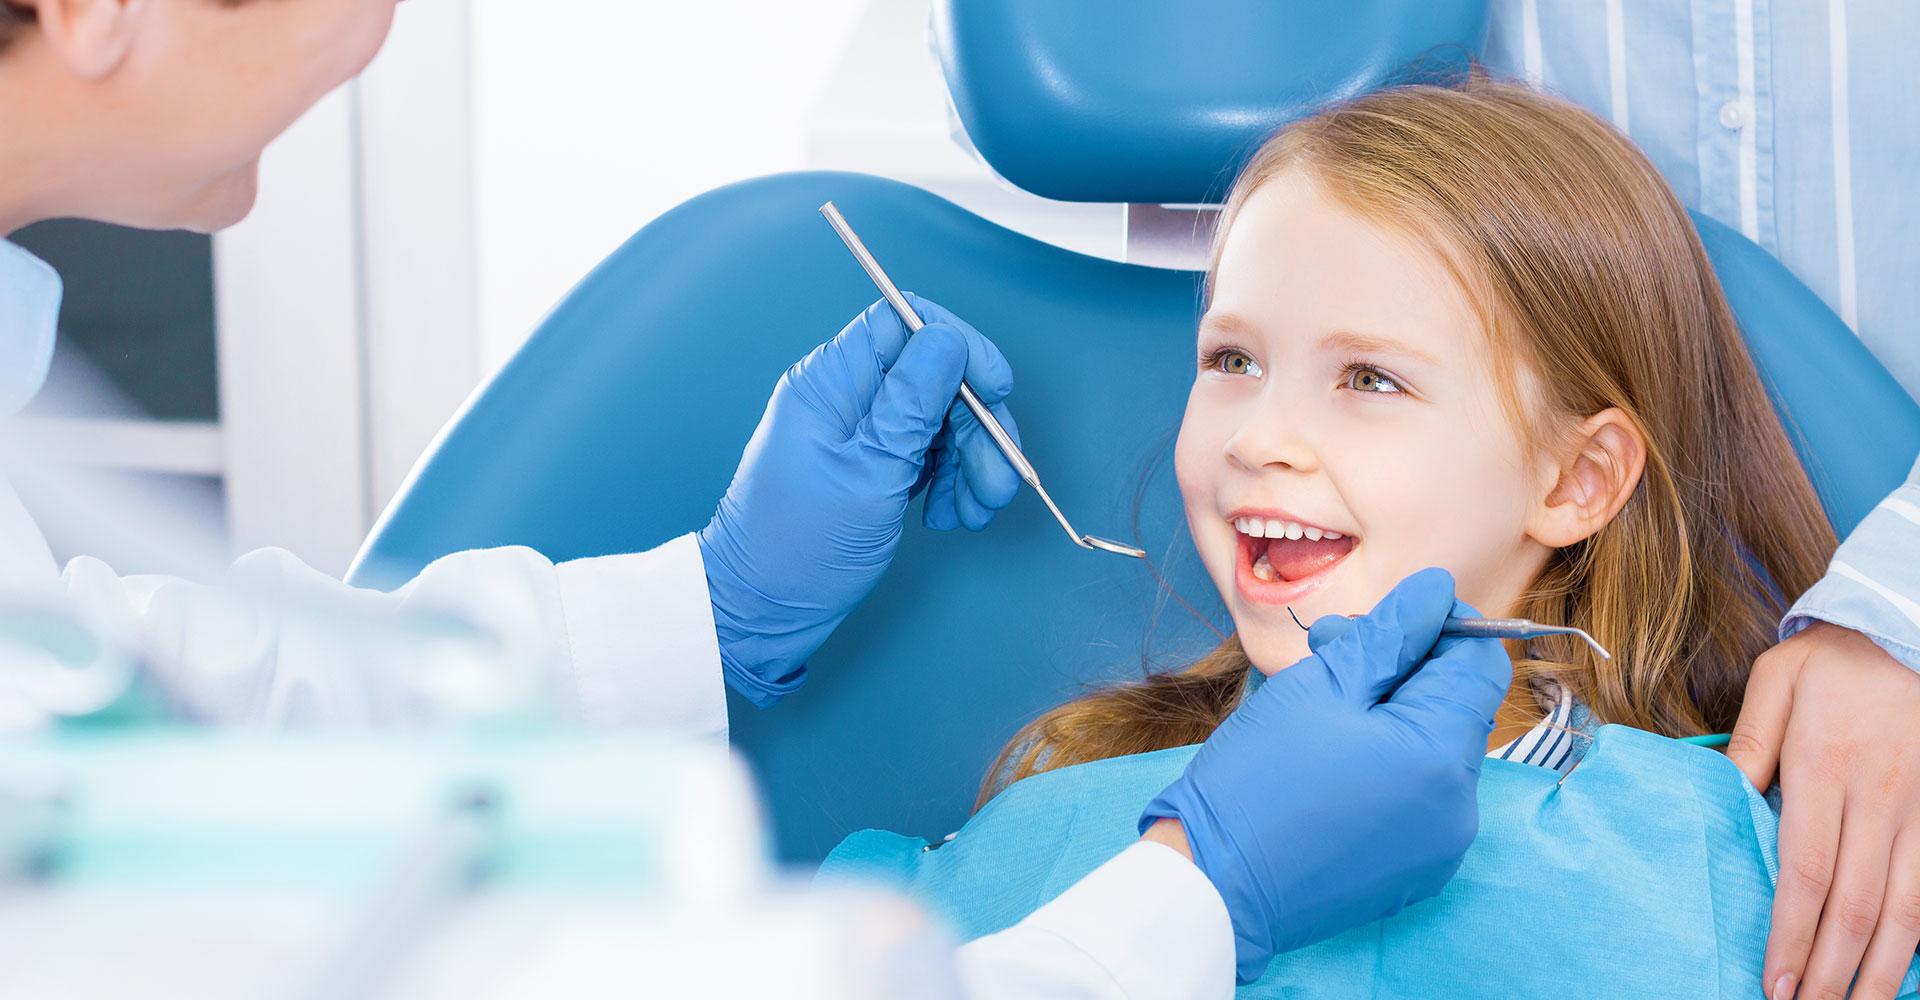 Kalkberg Zahnärzte Bad Segeberg Kinder-Zahnheilkunde Zahnmedizin